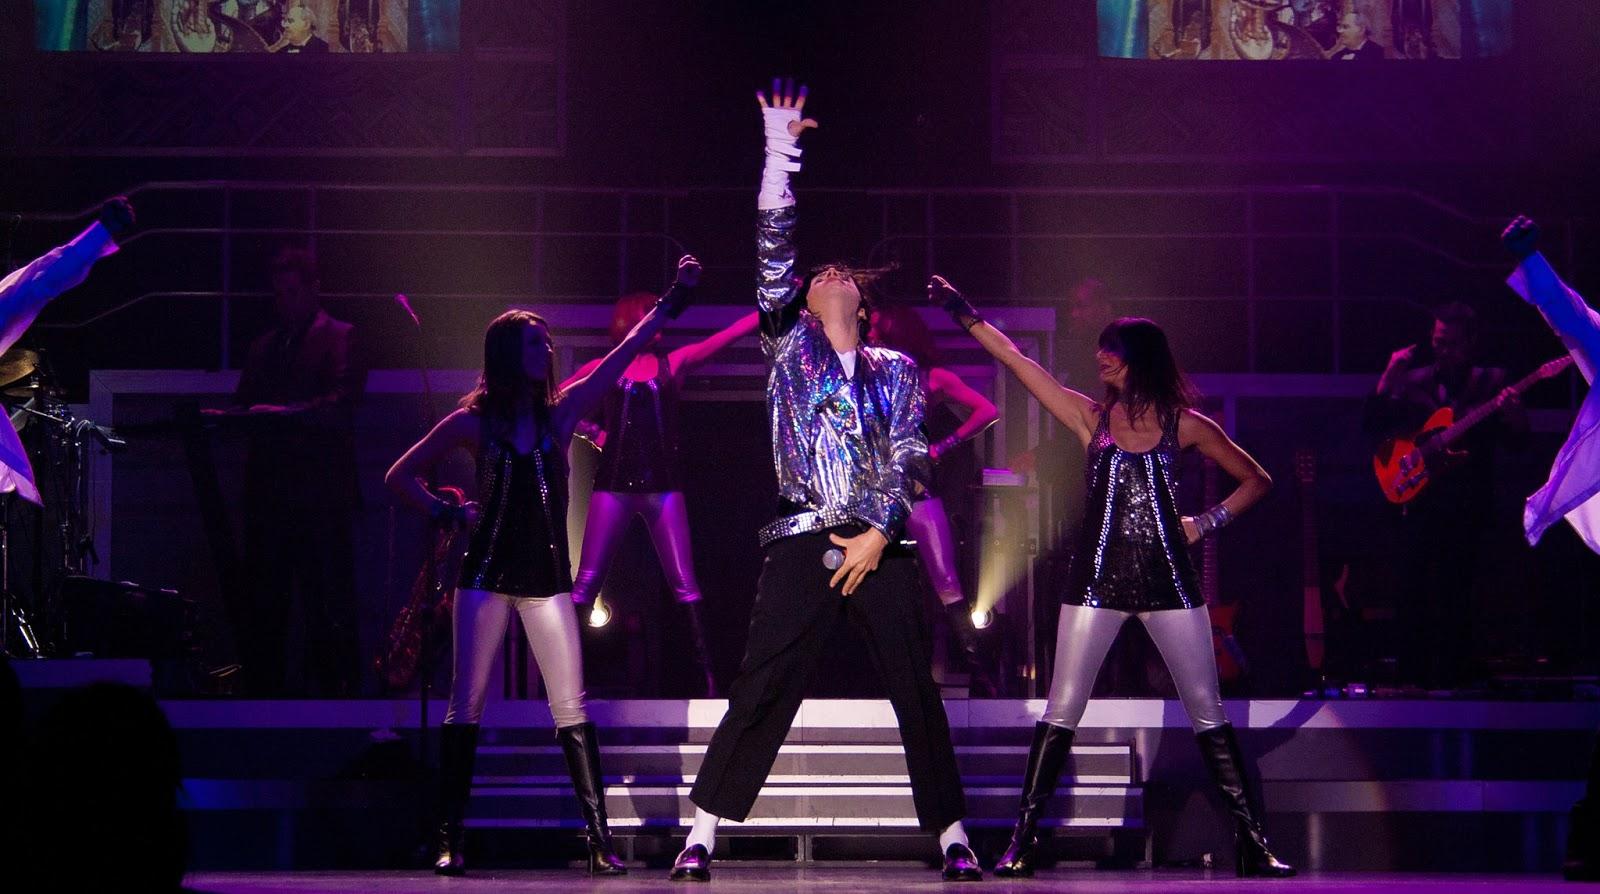 Delfim Miranda - Michael Jackson Tribute - Legends in Concert in Las Vegas (USA) - Jam